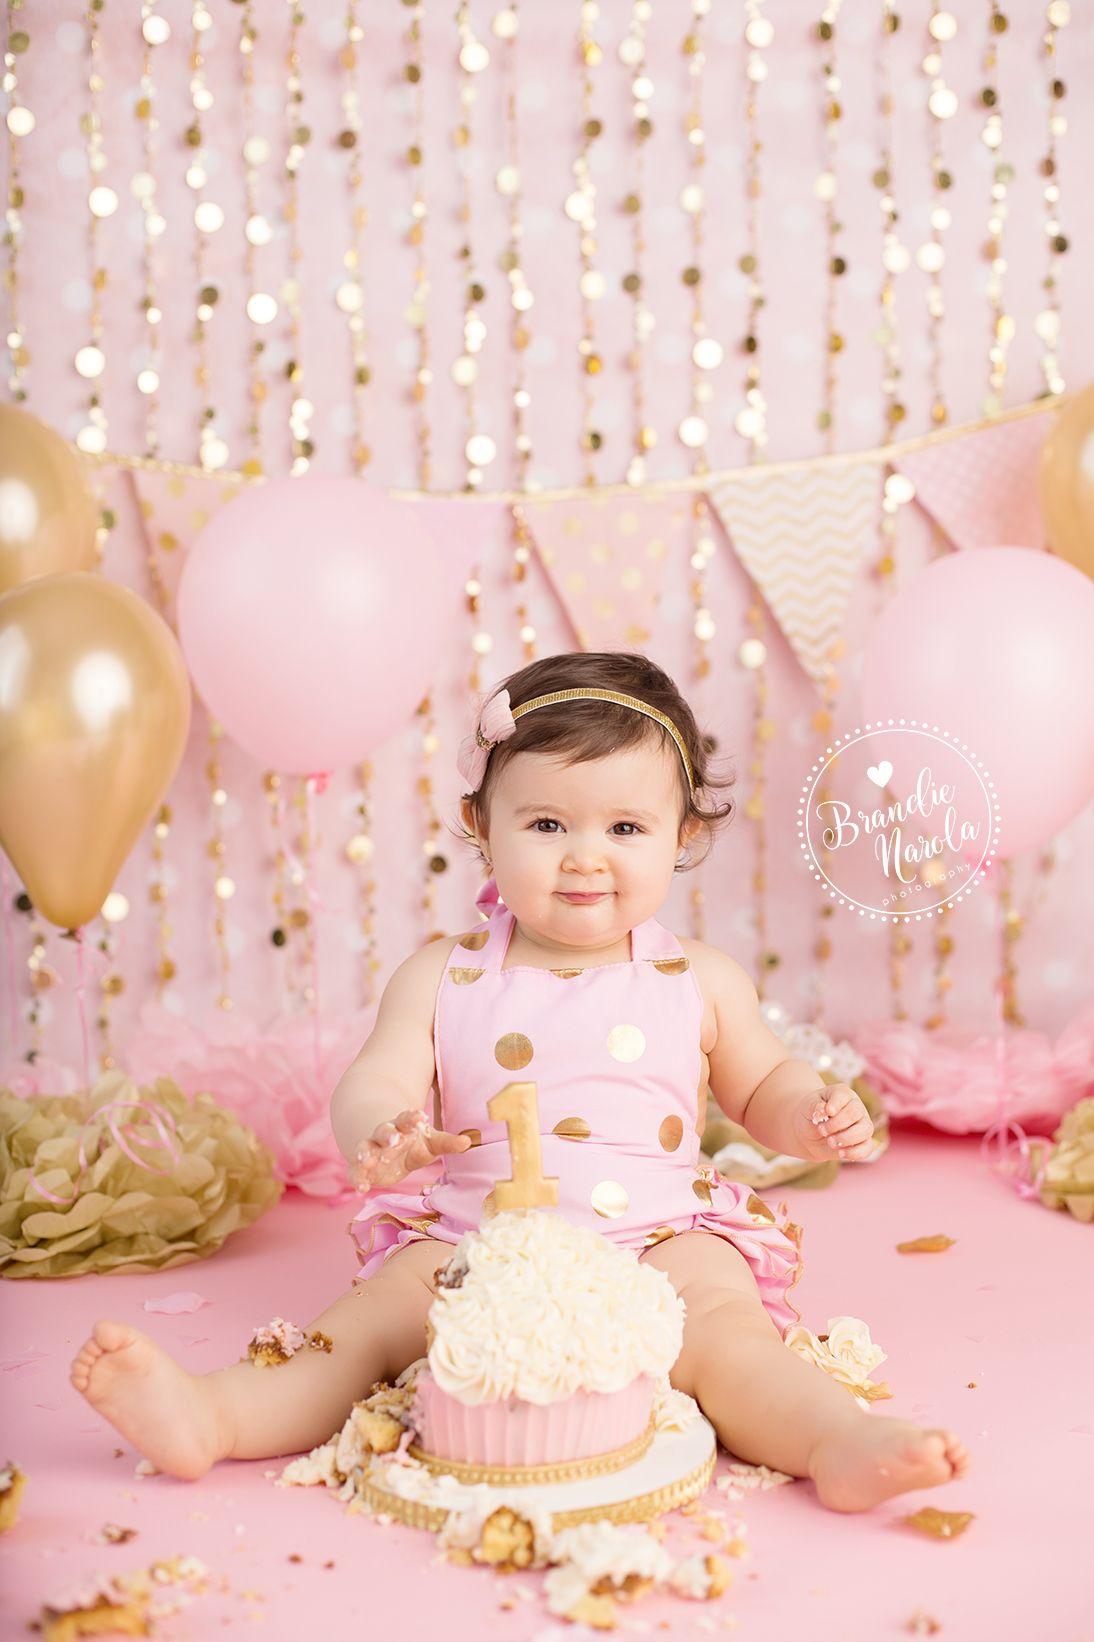 Cake smash smash cake girl birthday girl pictures